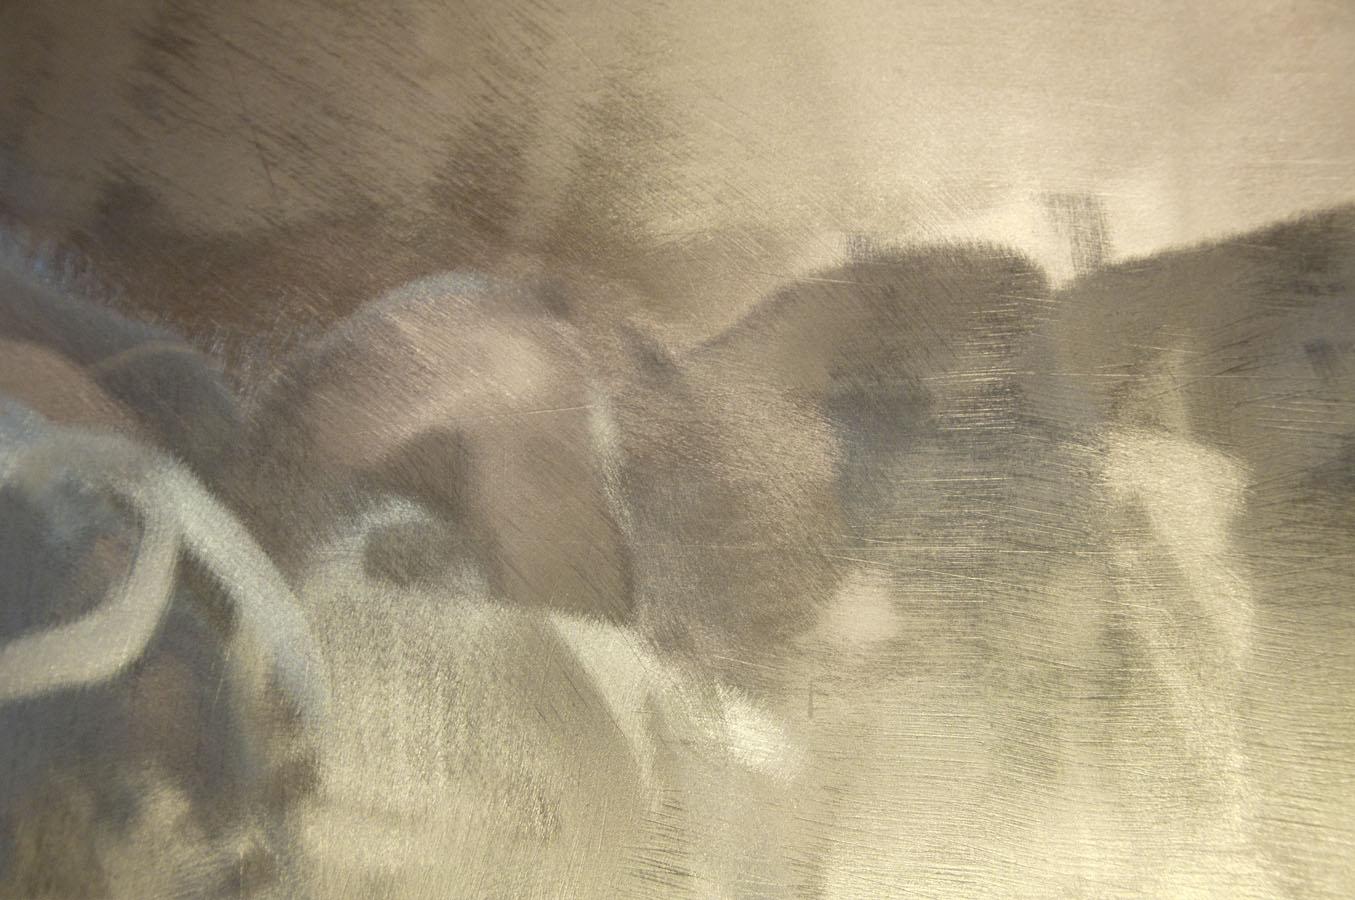 Freydenberg_Matal_Painting_2013_4.jpg